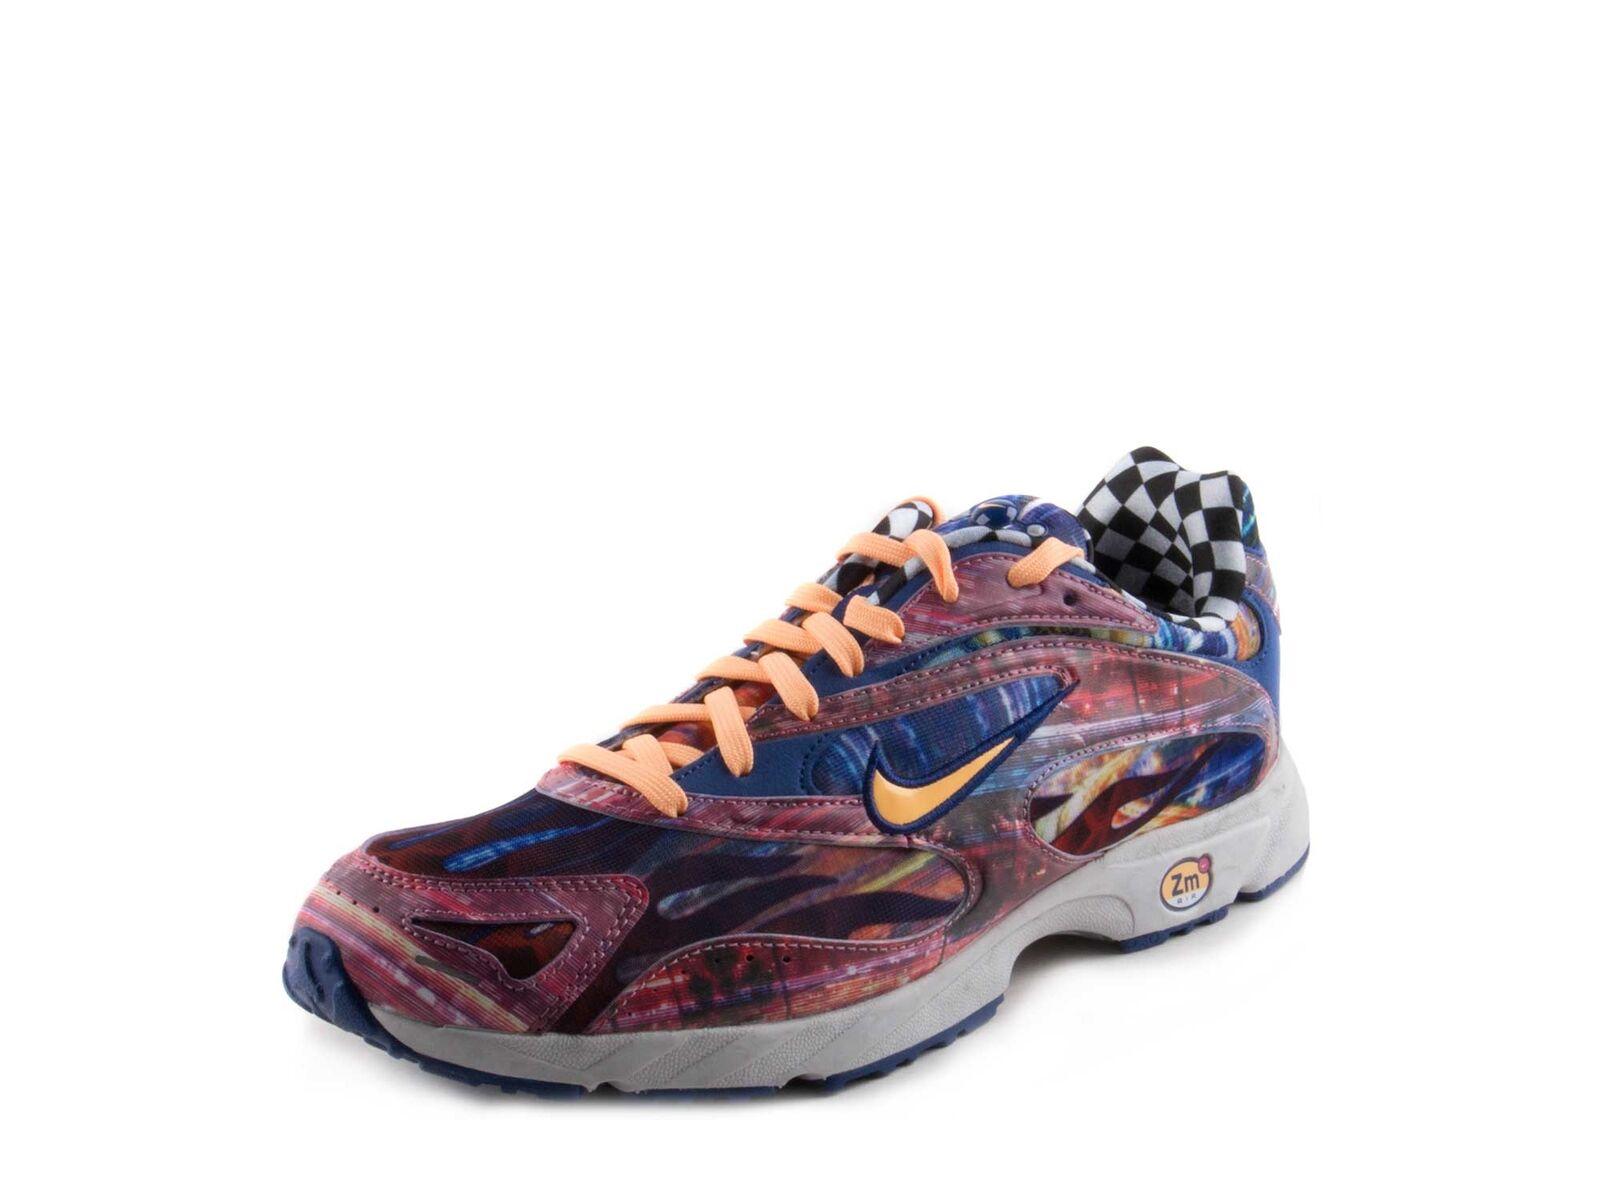 Nike Mens ZM Streak Spectrum Plus Prem Melon Tint Tint Tint Palest viola  AR1533-800 342e99